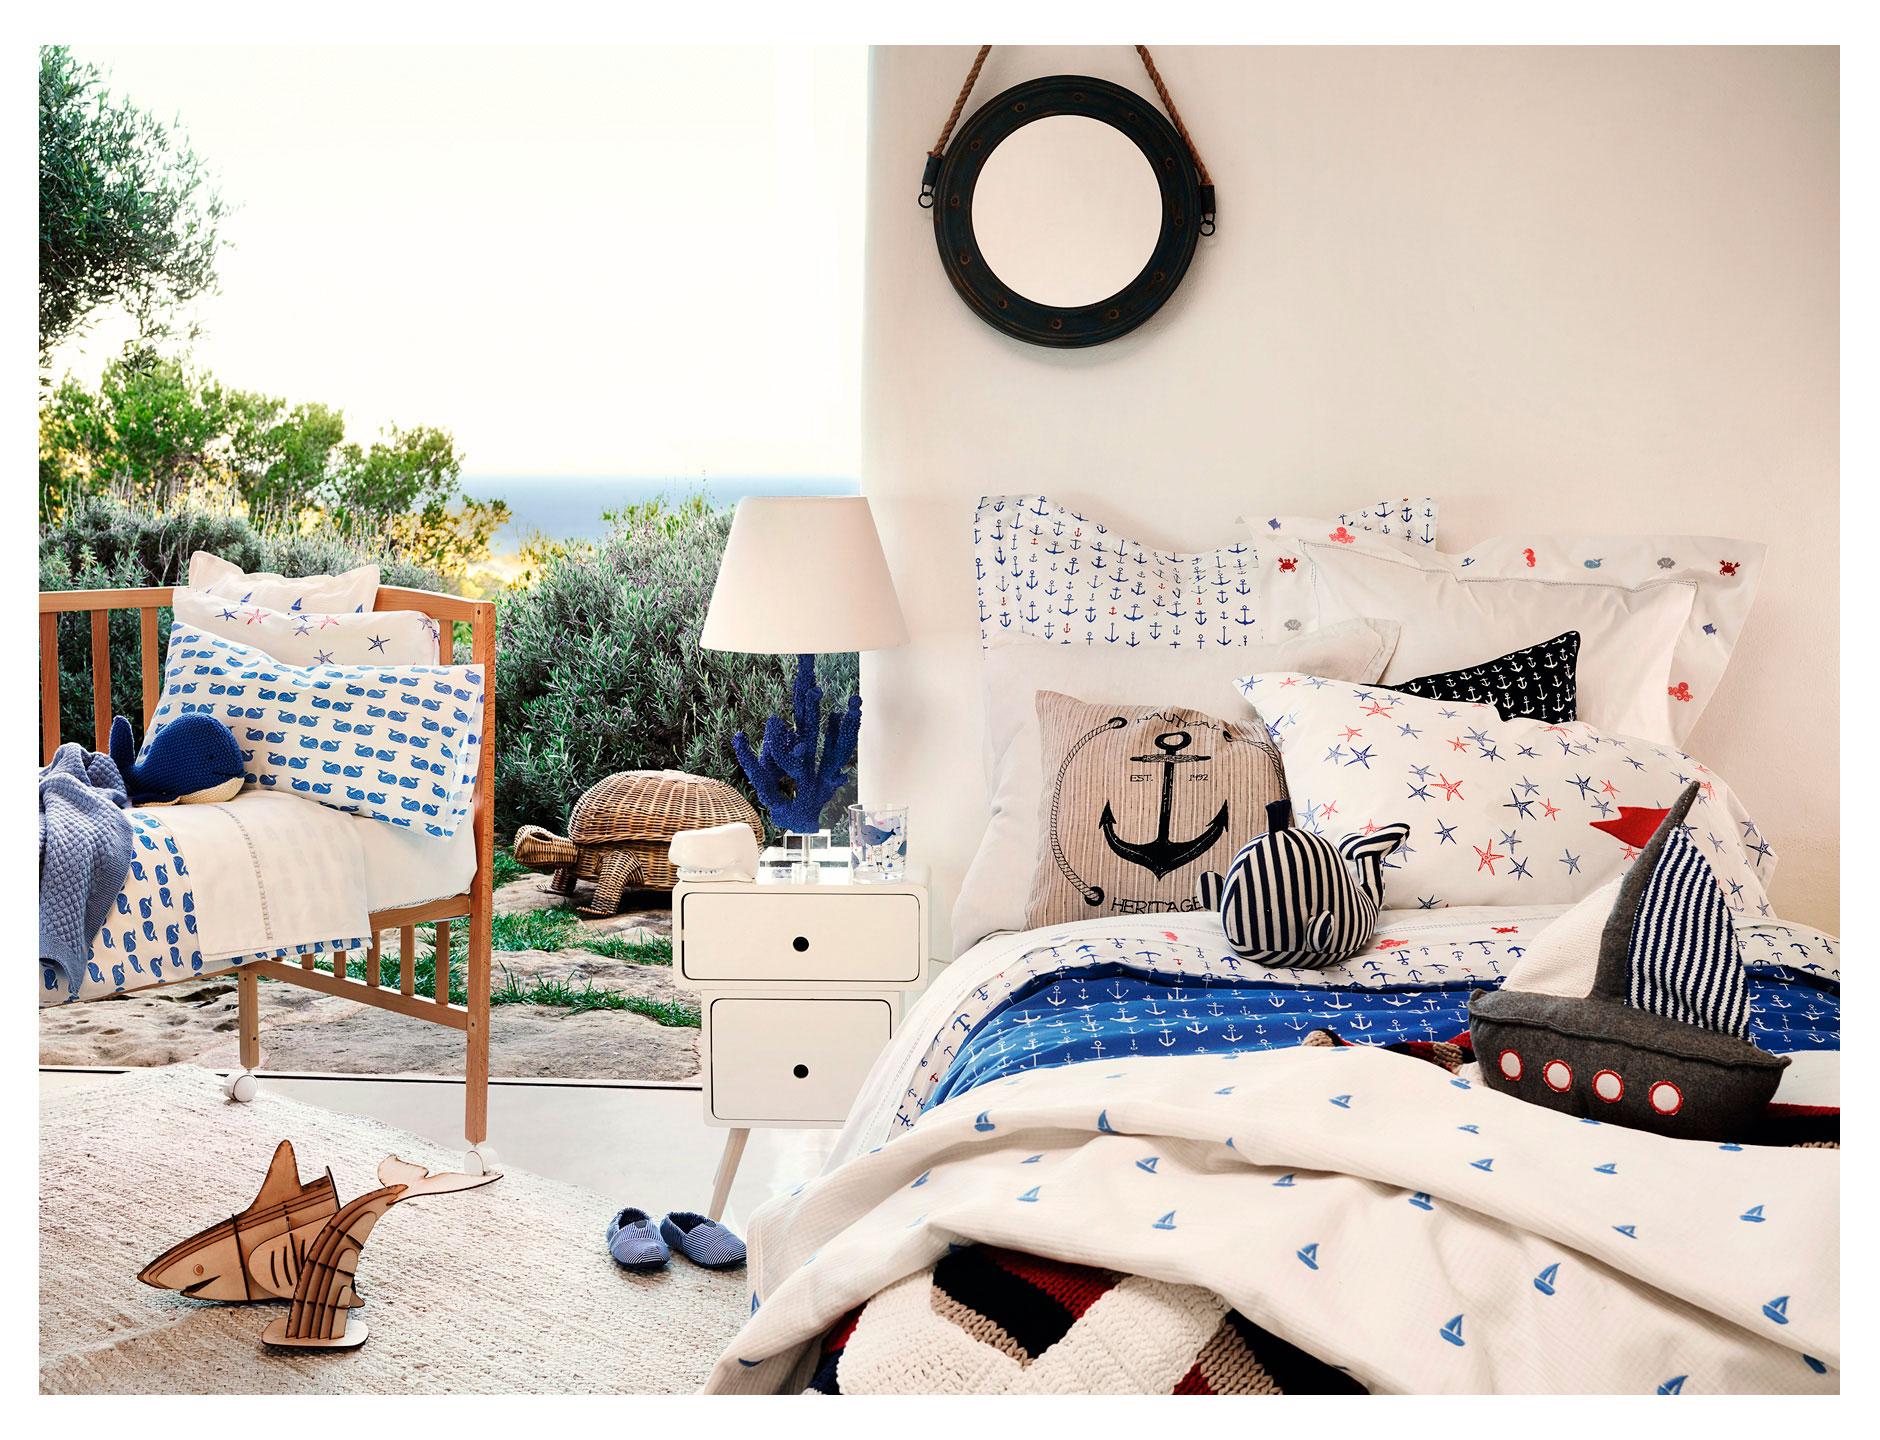 Zara home primavera verano 201541 for Zara home muebles catalogo